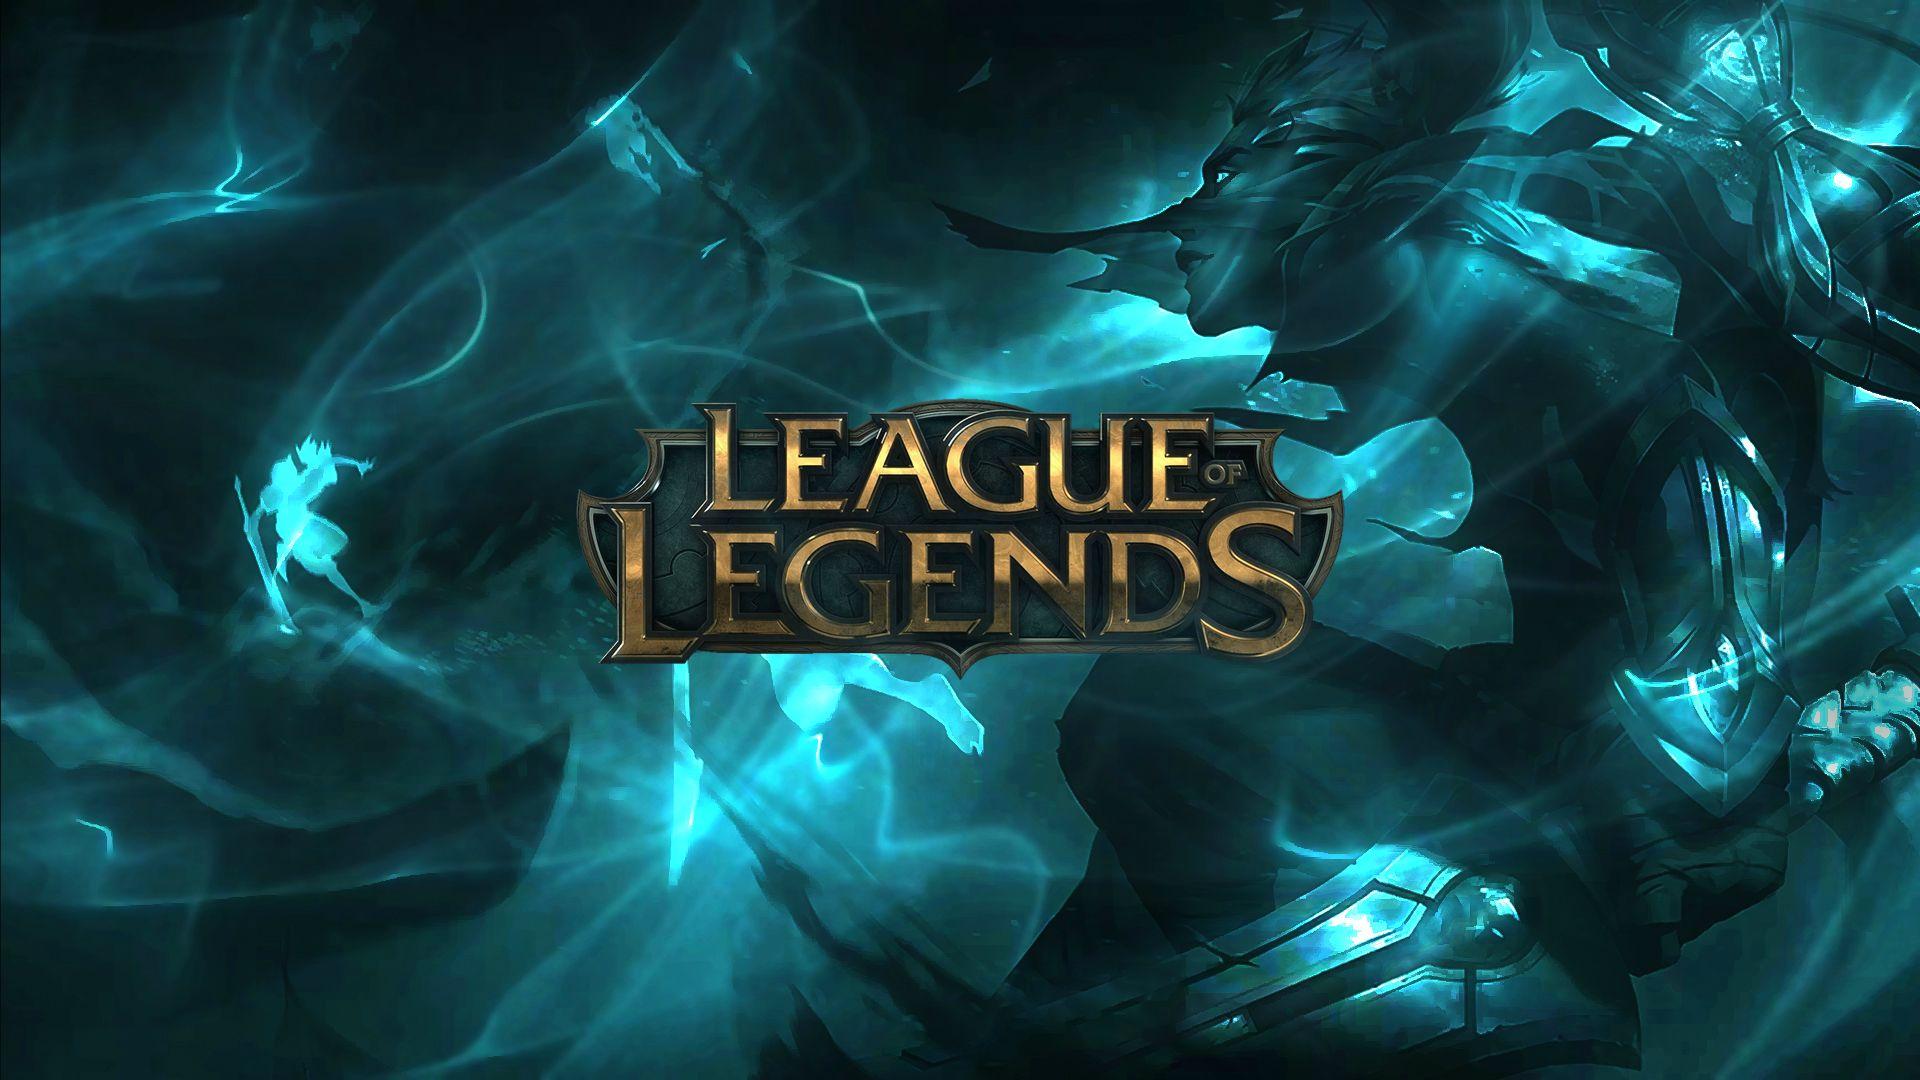 League Of Legends Wallpaper Logo - 1920x1080 - Download HD ...